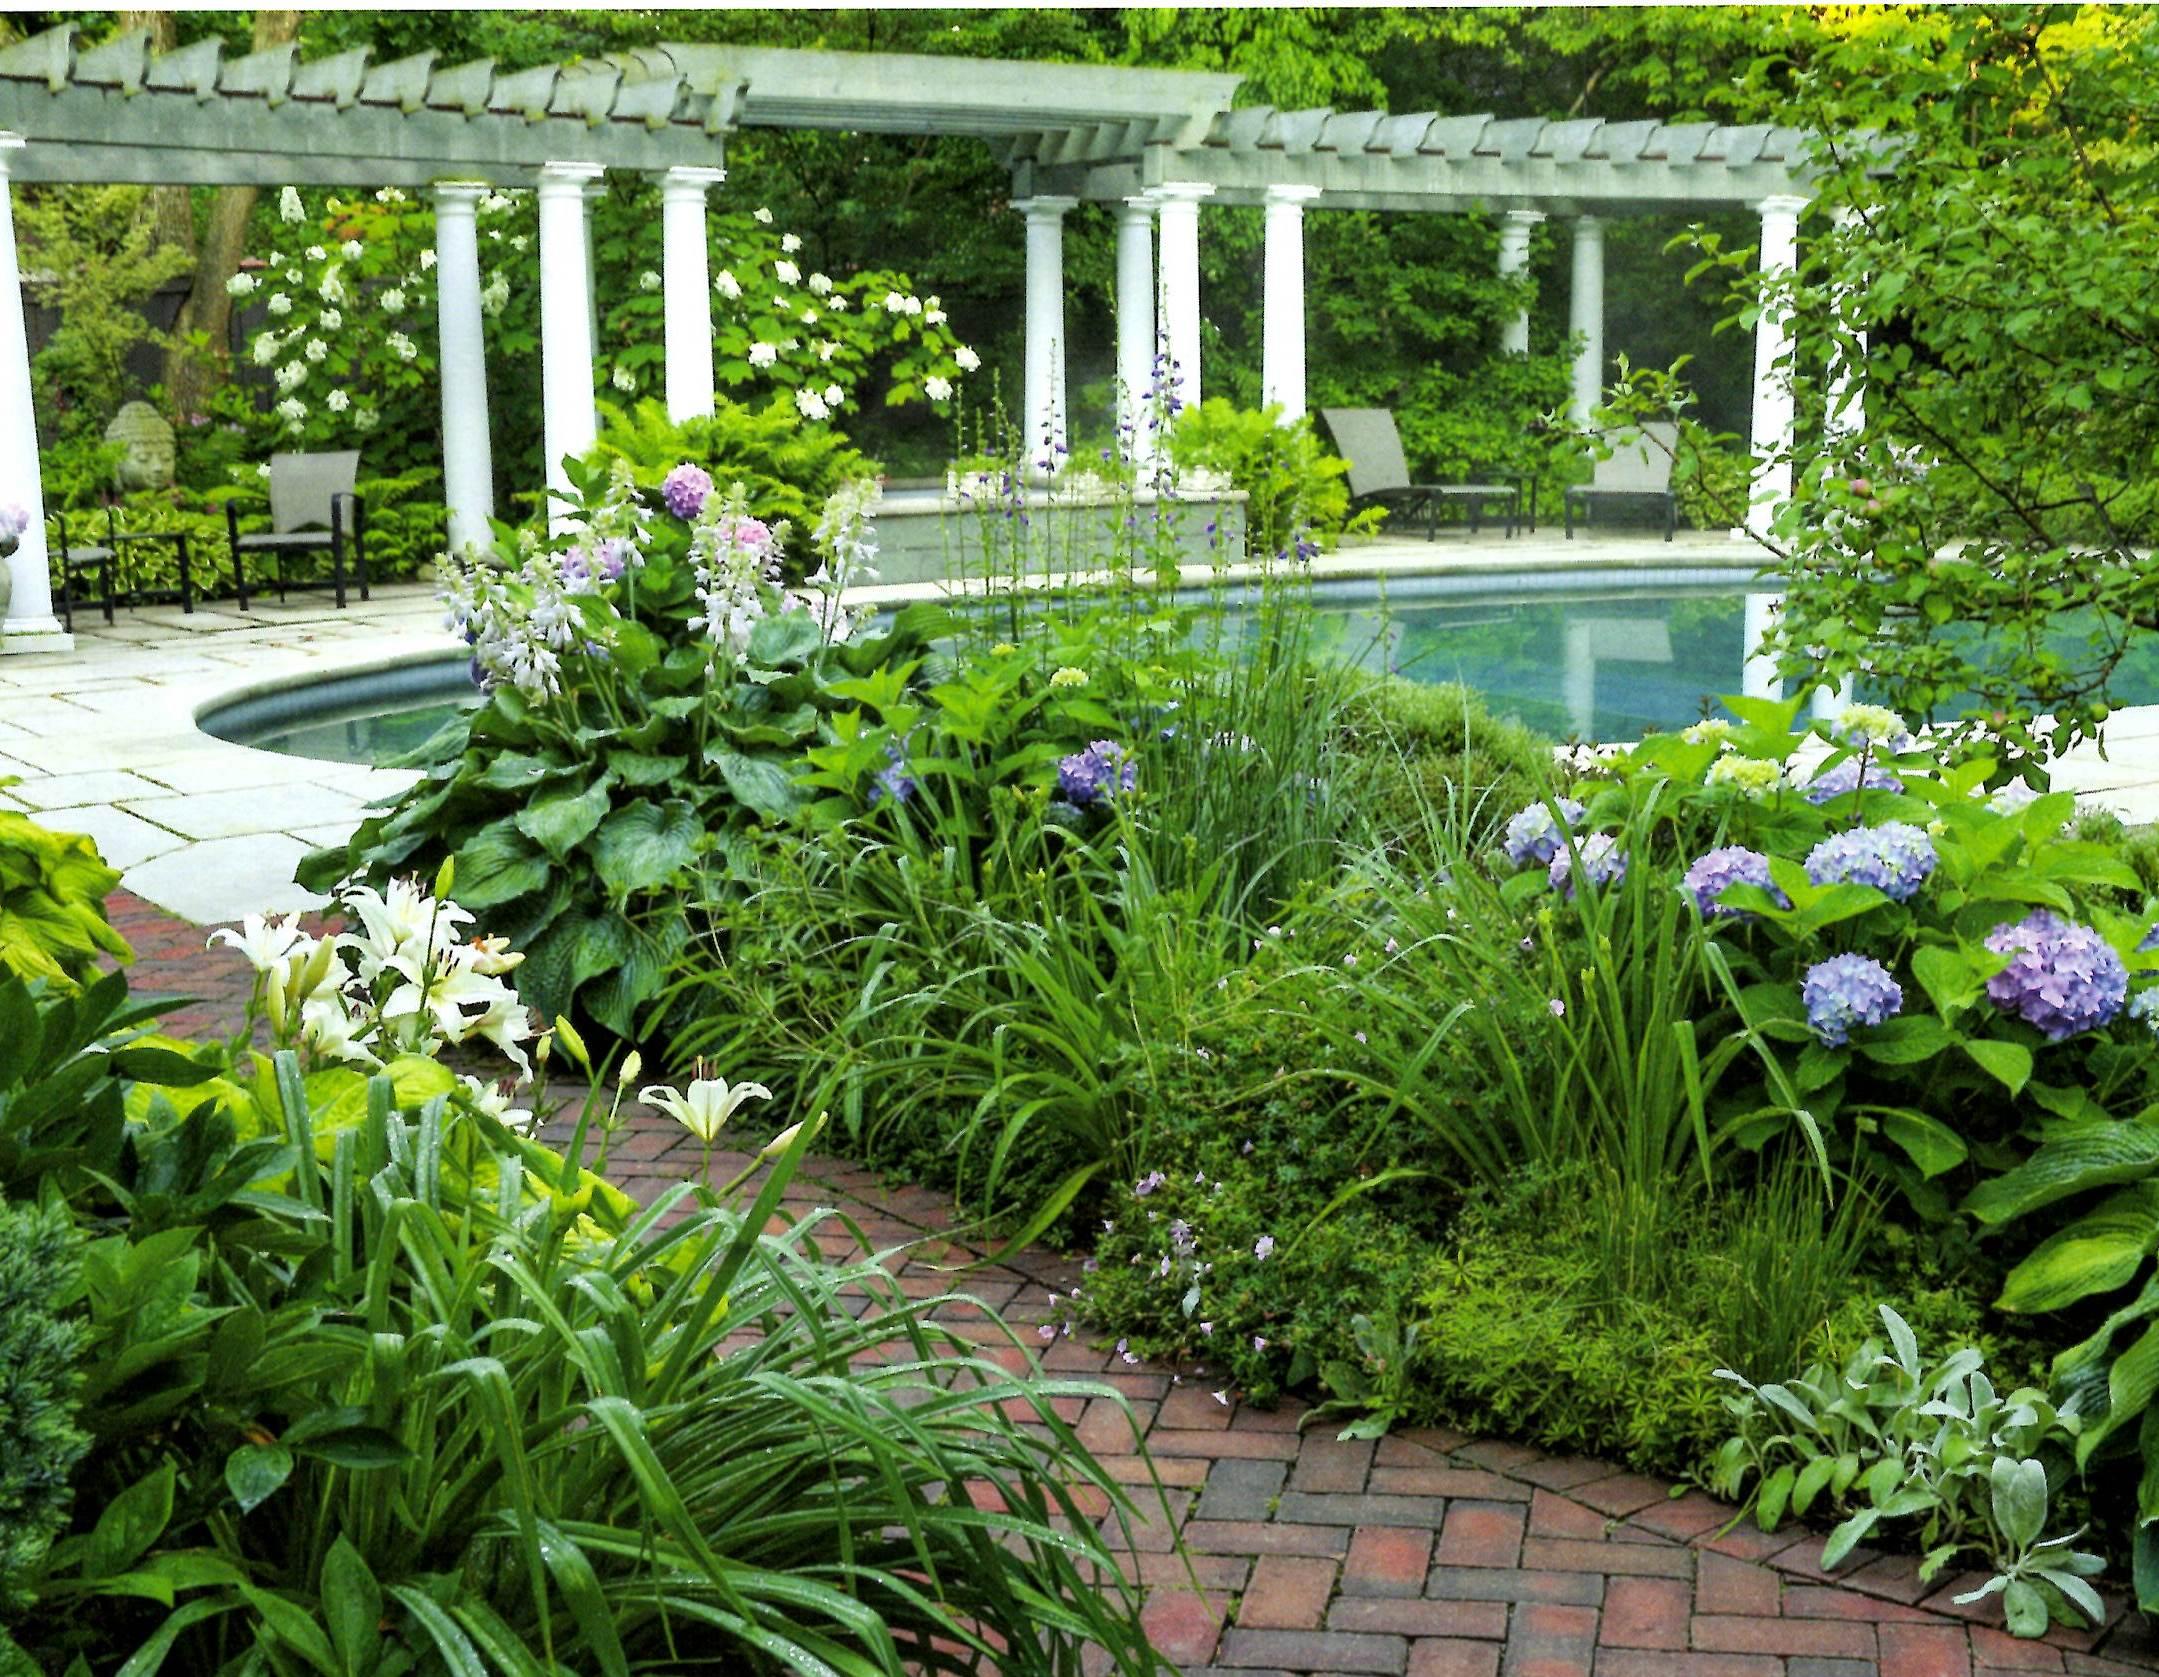 13th Annual Shaker Heights Gracious Garden Tour Gardenopolis